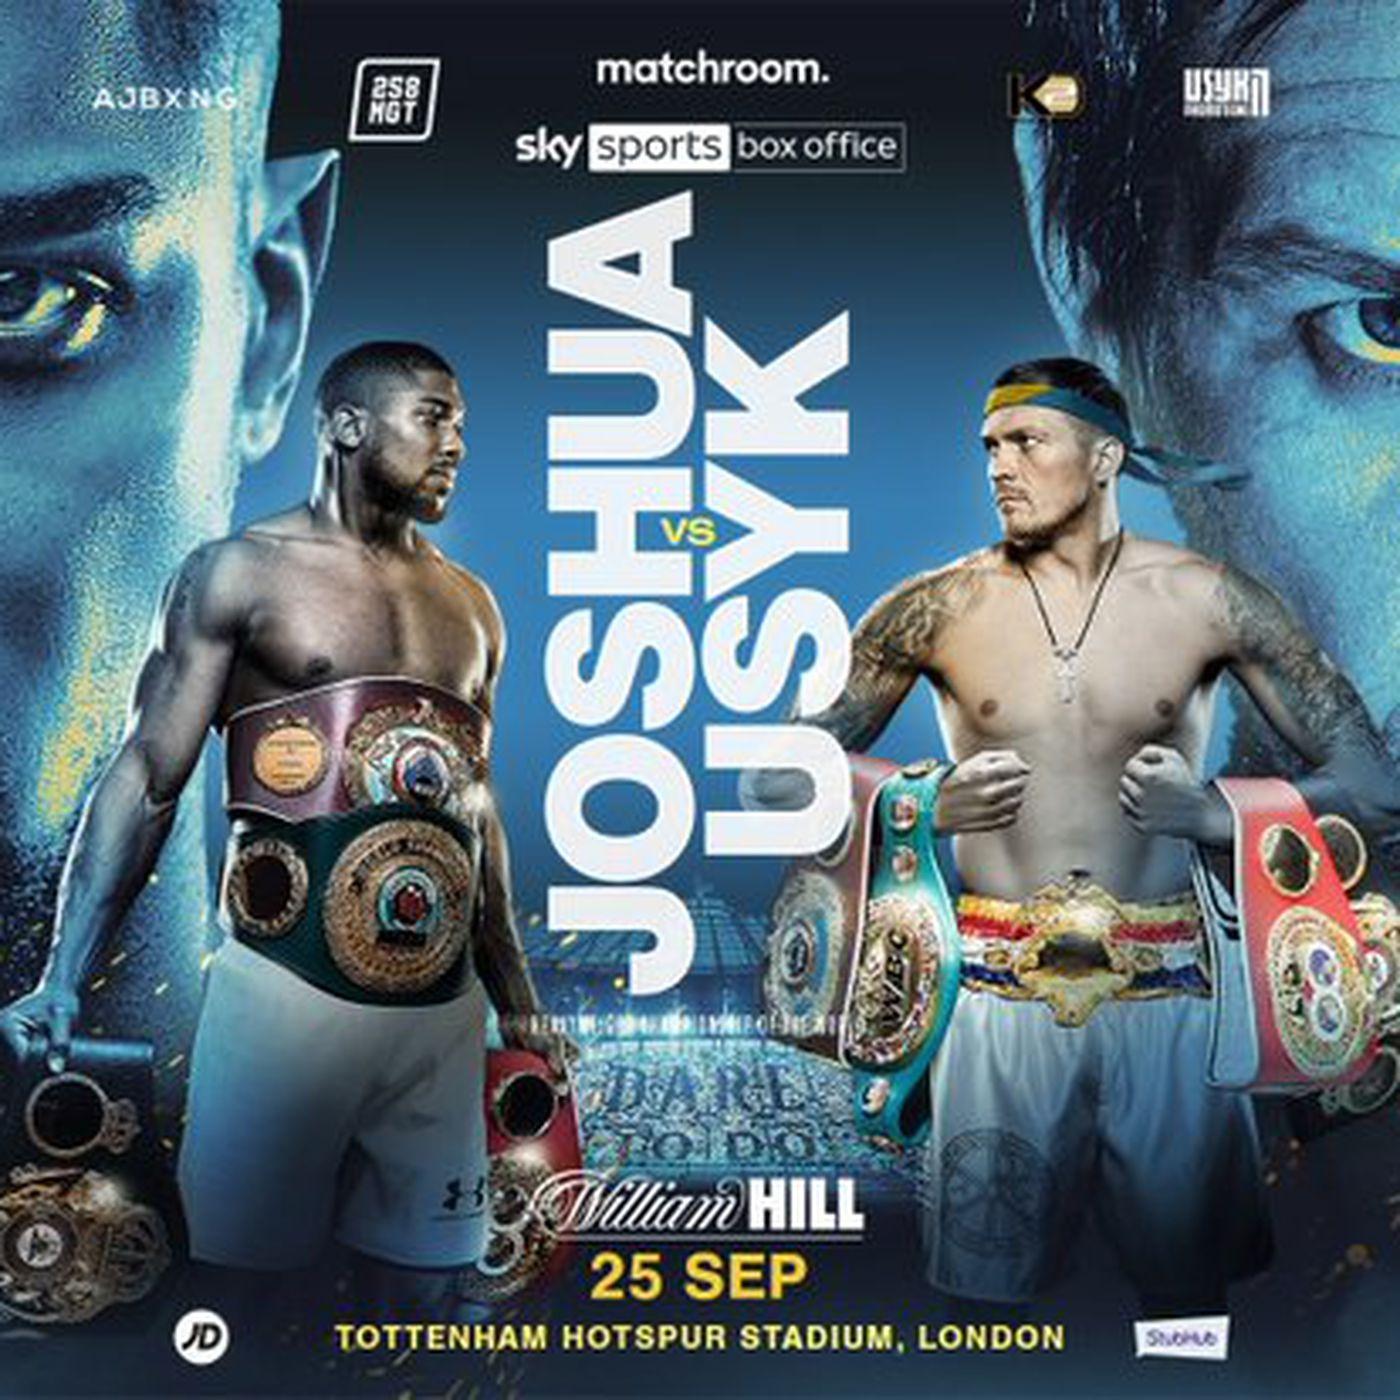 Joshua will expose his WBA Super Championship against Usyk in Tottenham